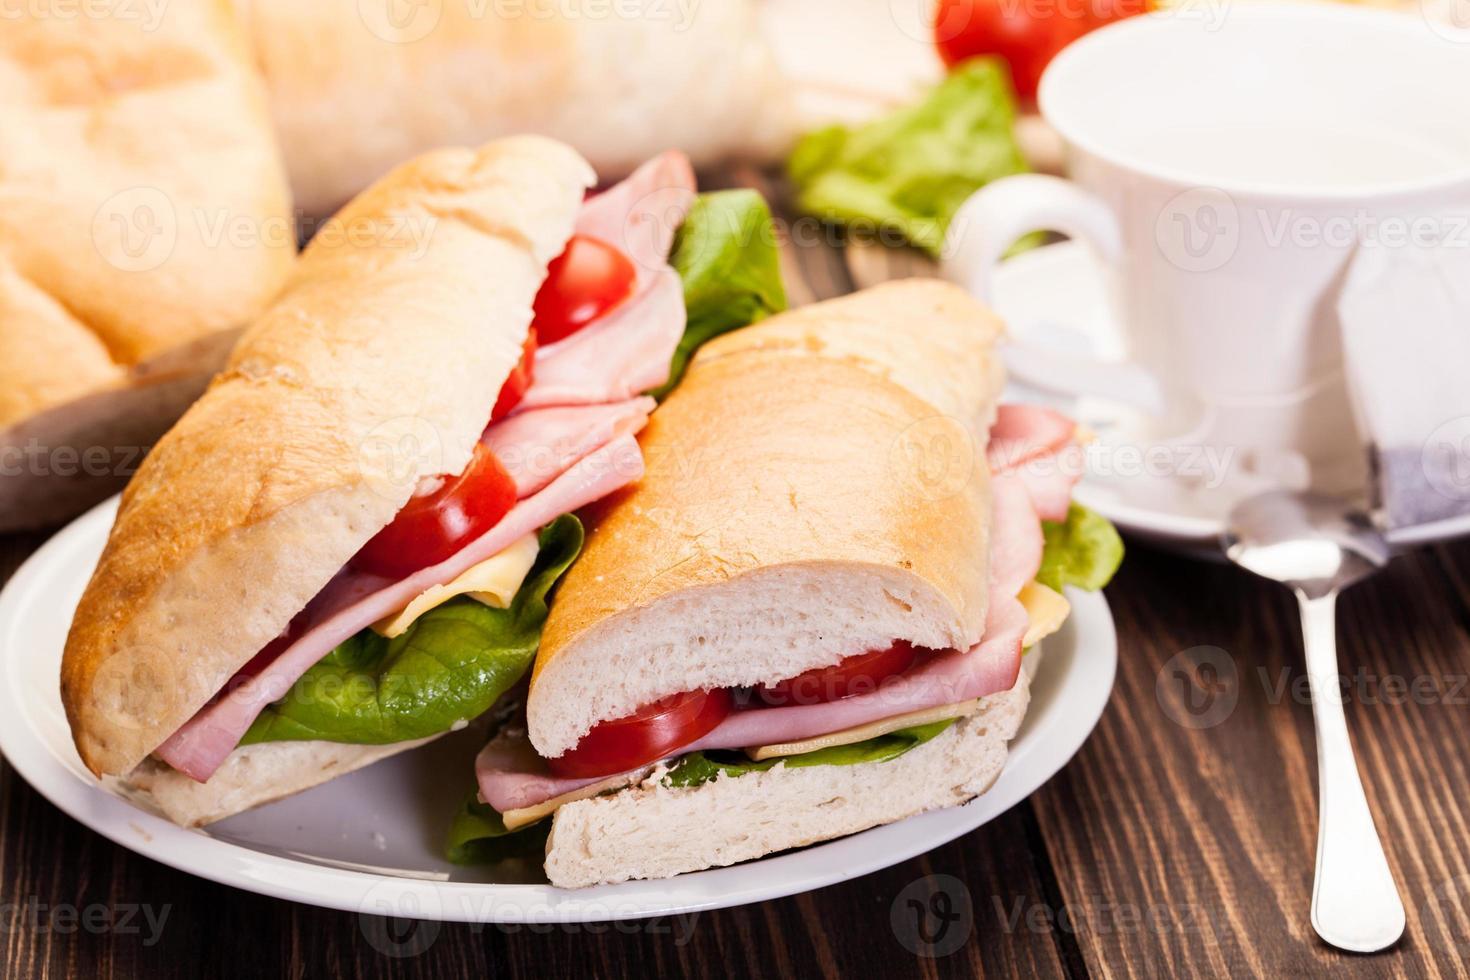 sándwich de panini con jamón, queso y tomate foto